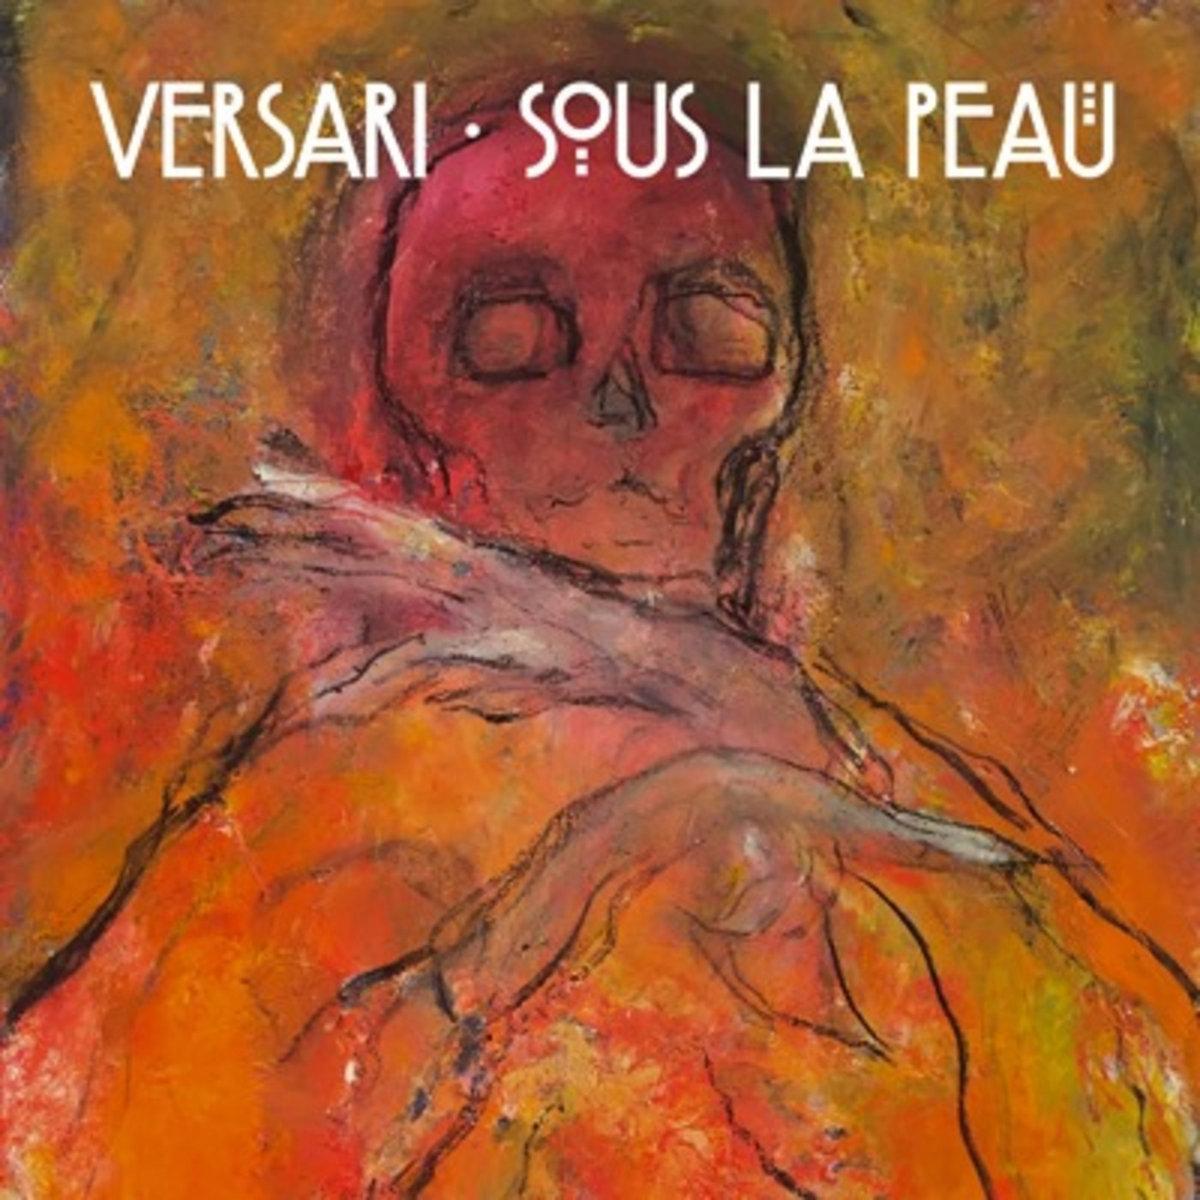 Post-punk shivers – Versari – Sous la peau